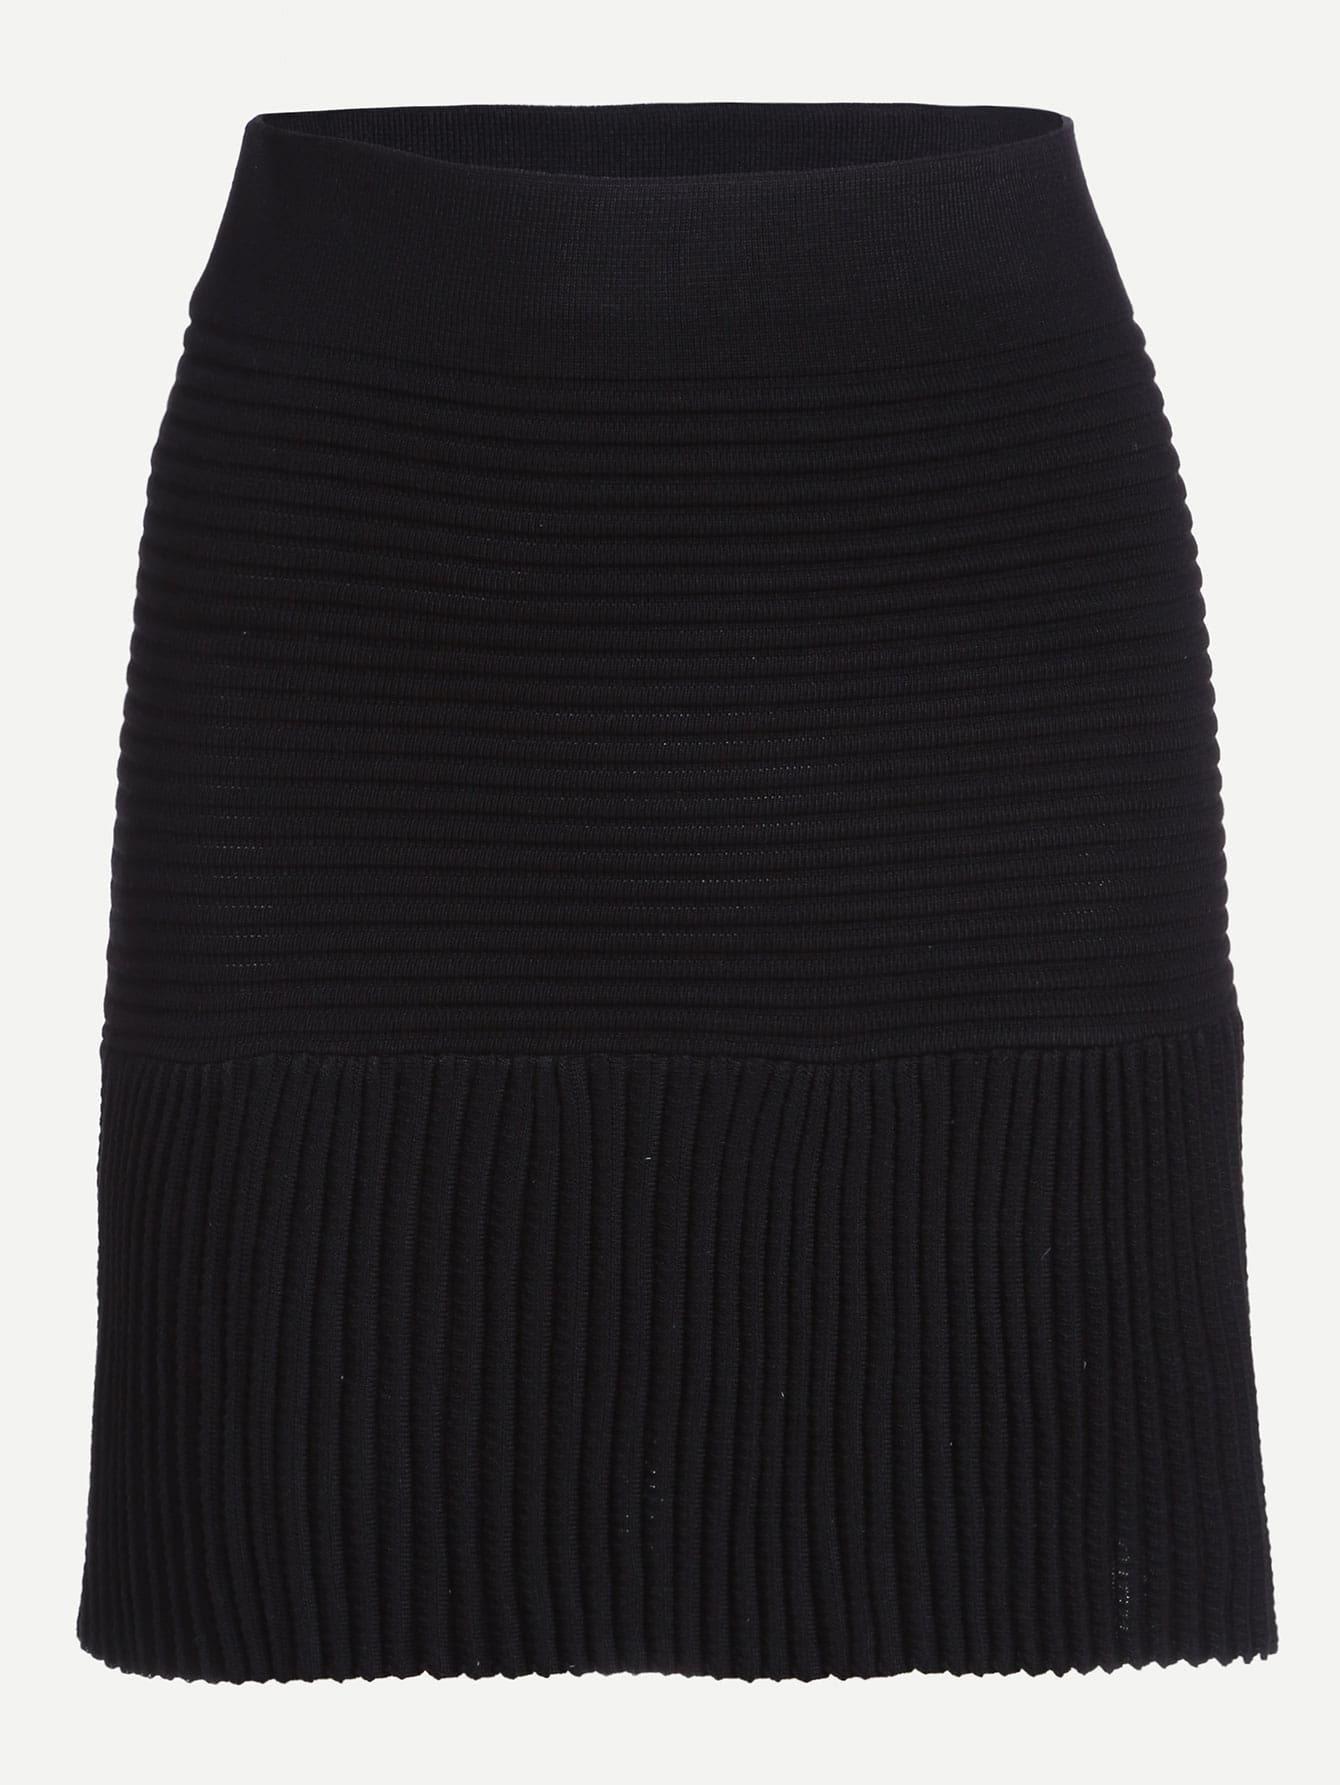 black ribbed knit a line skirt